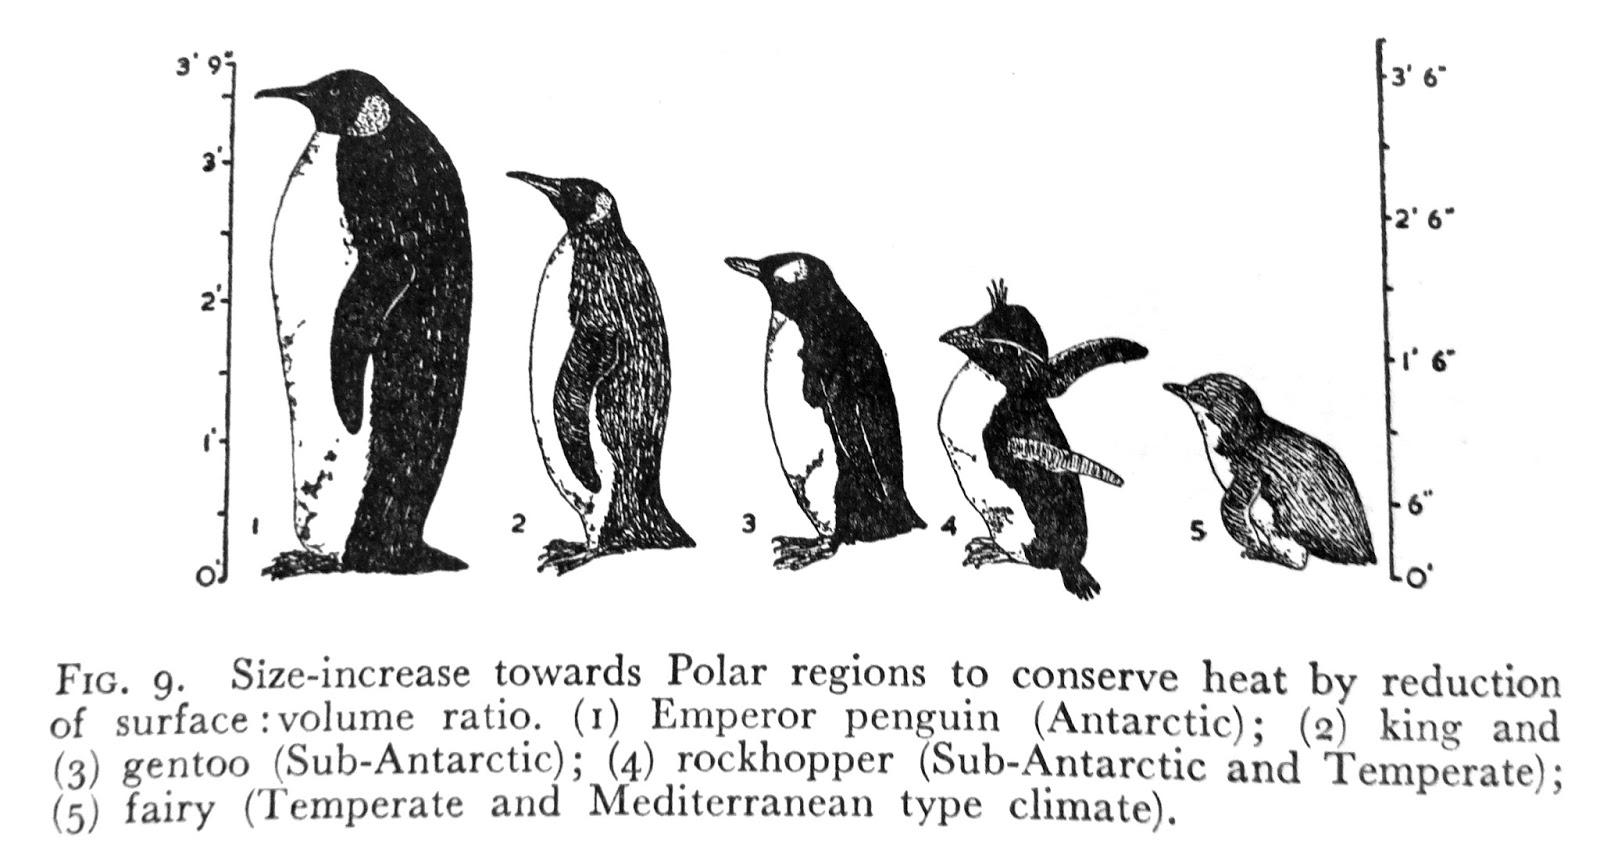 sconzani: 'Dedicated Naturalist': Shackleton's Penguin